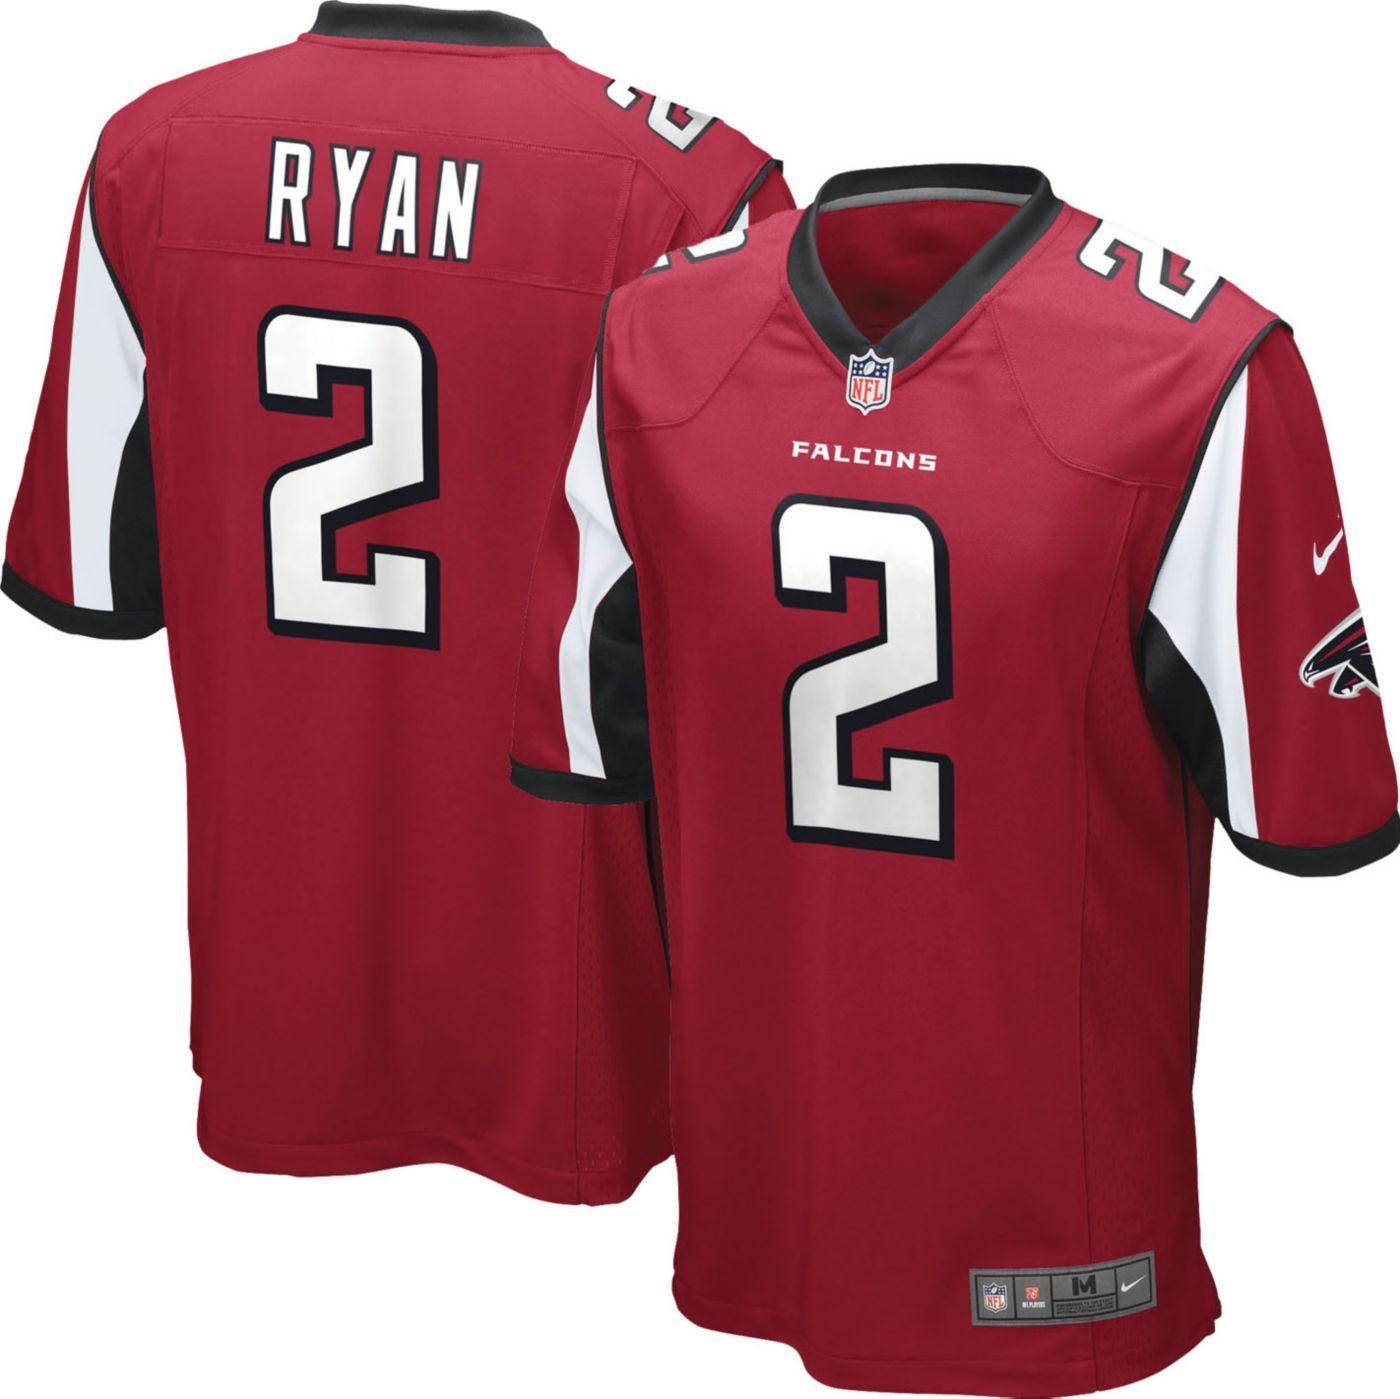 Nike Youth Home Game Jersey Atlanta Falcons Matt Ryan #2